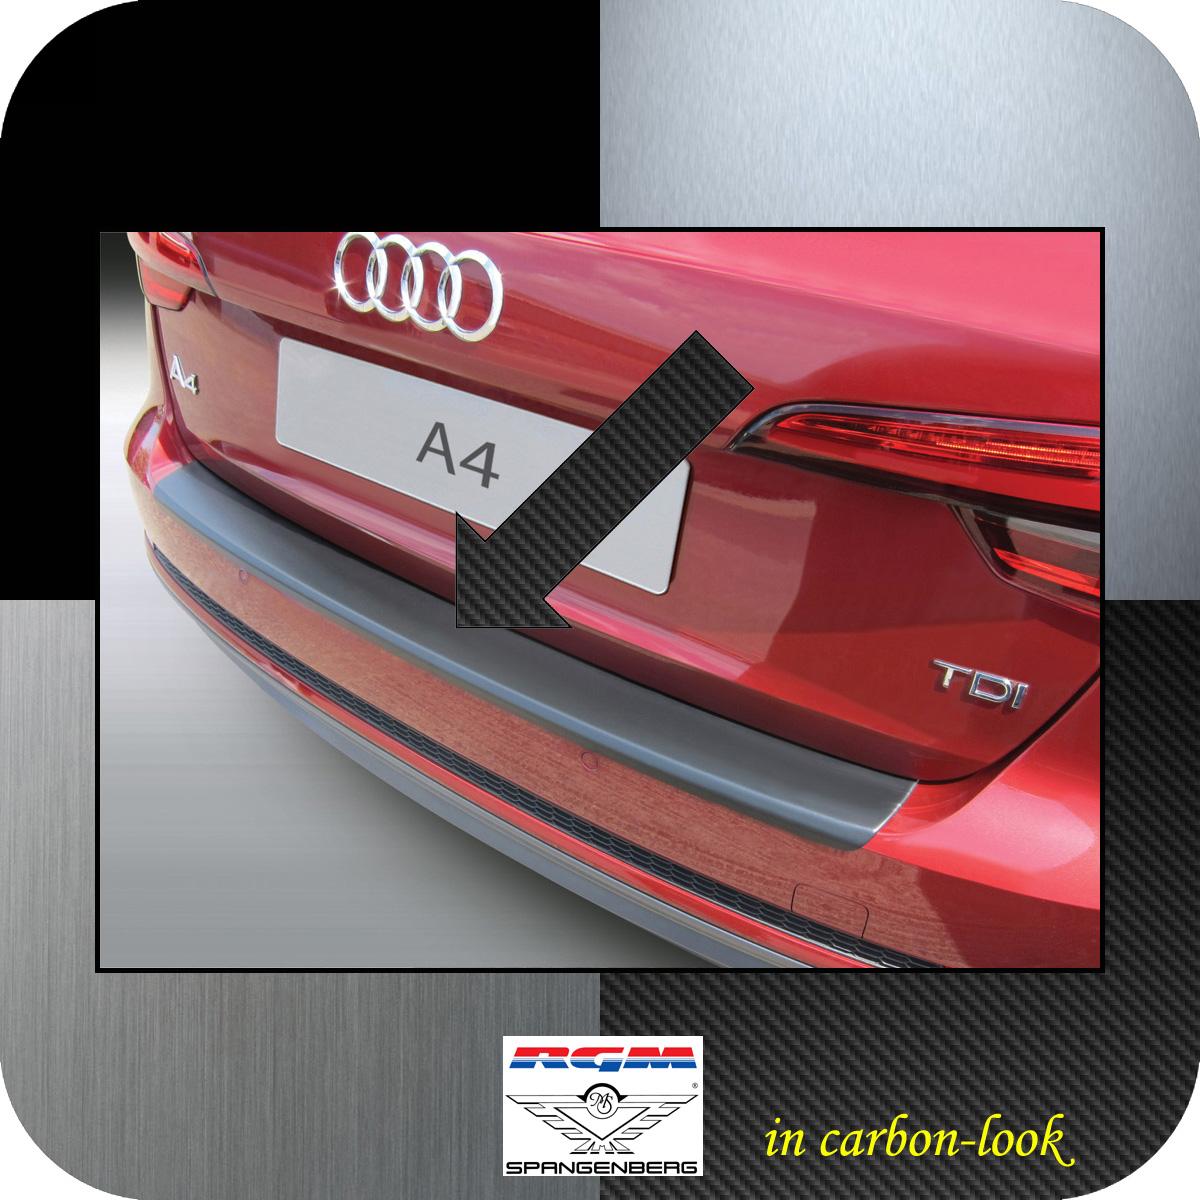 Ladekantenschutz Carbon-Look Audi A4 B9 Avant auch S-Line 5-Türer 2015- 3509894